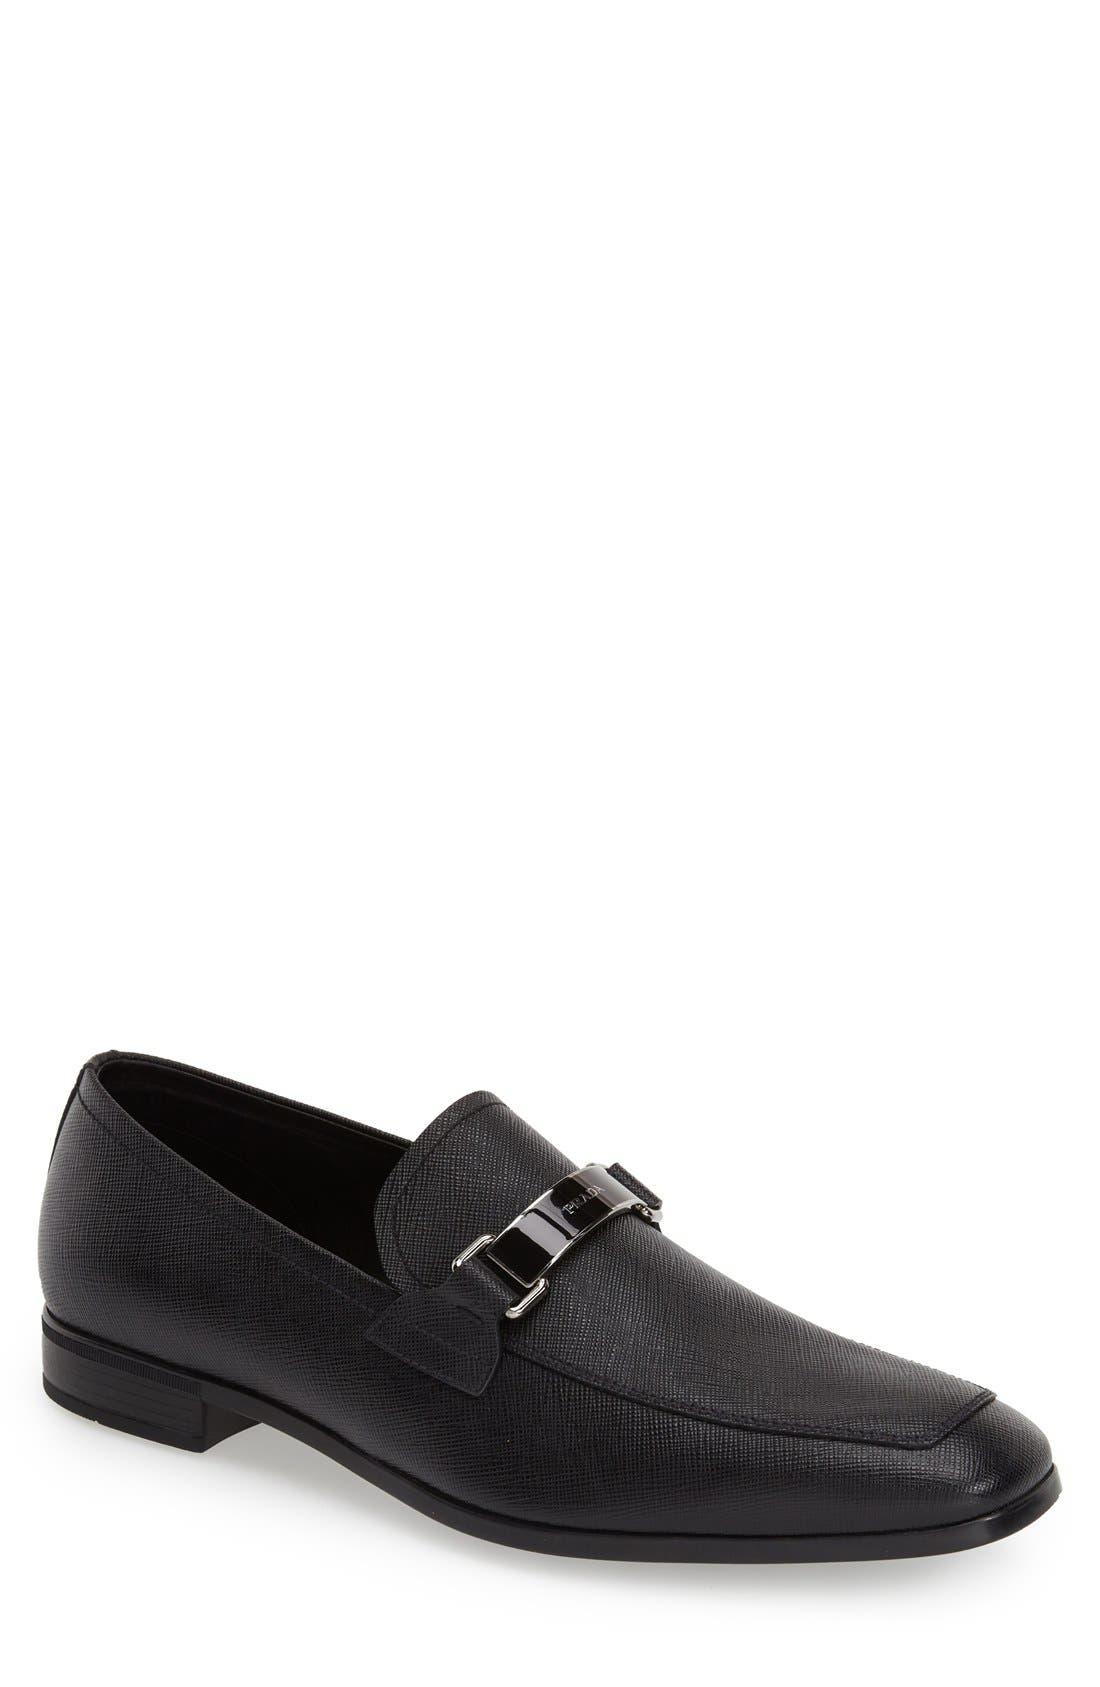 Saffiano Leather Bit Loafer,                         Main,                         color, Nero Leather